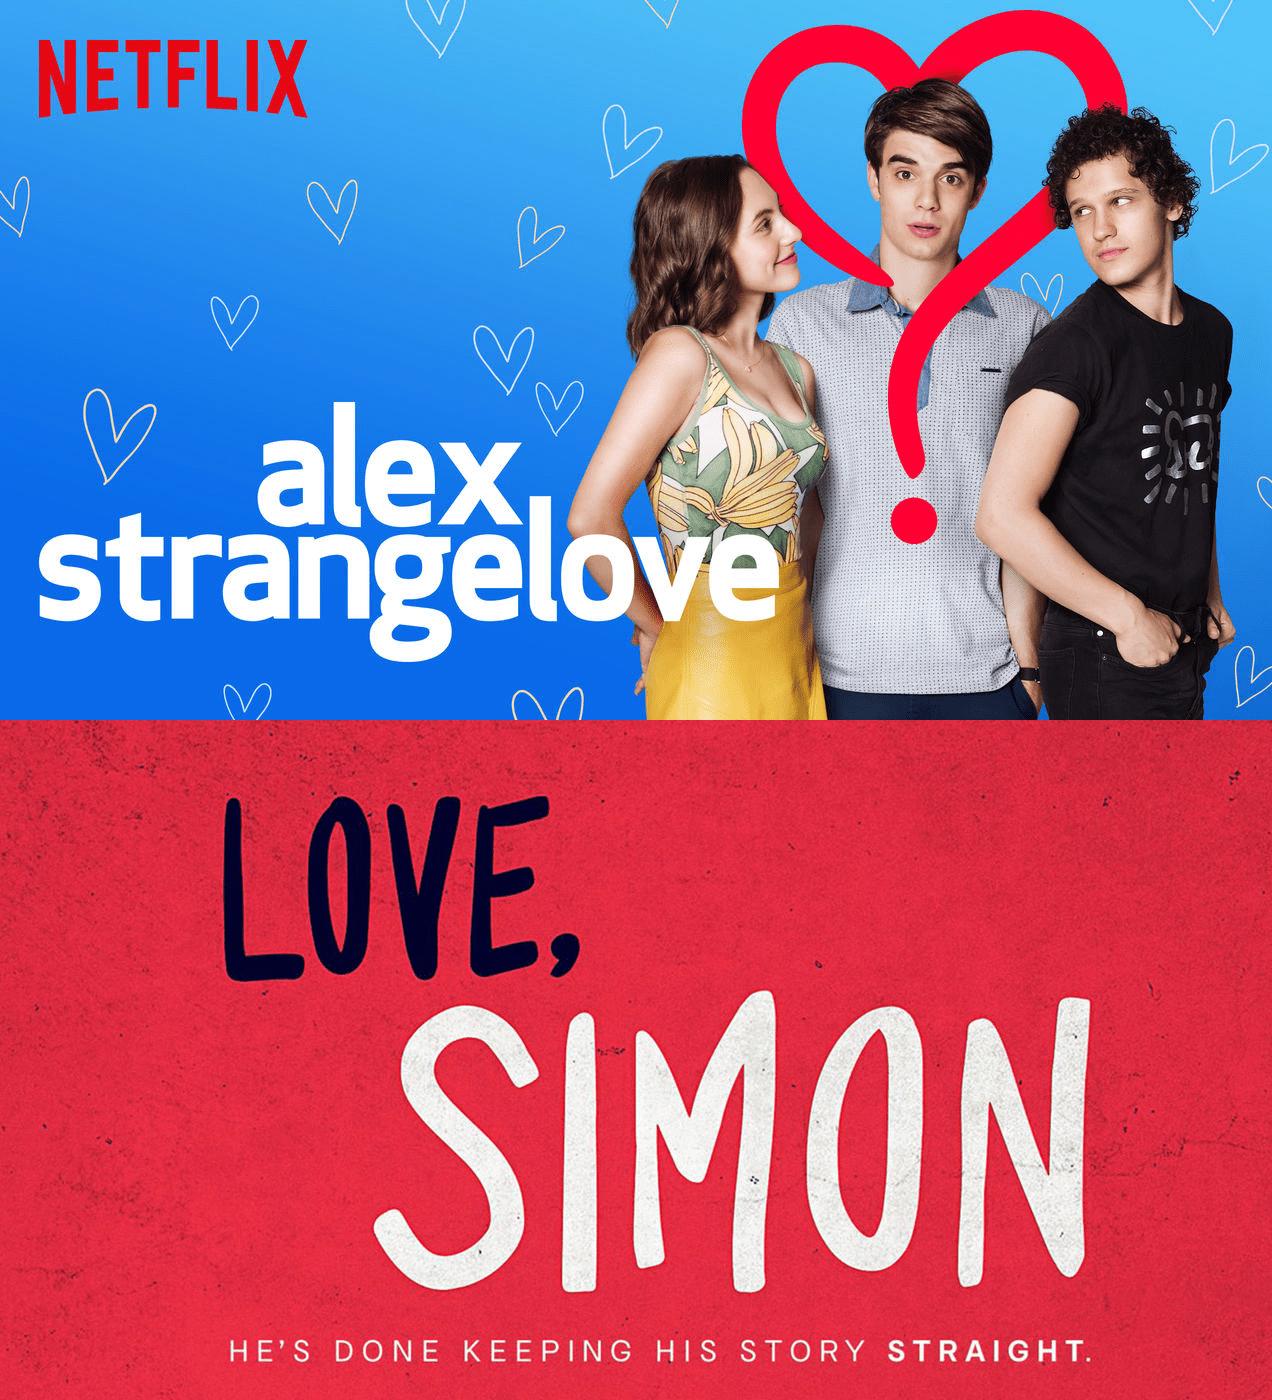 love simon alex strangelove.png